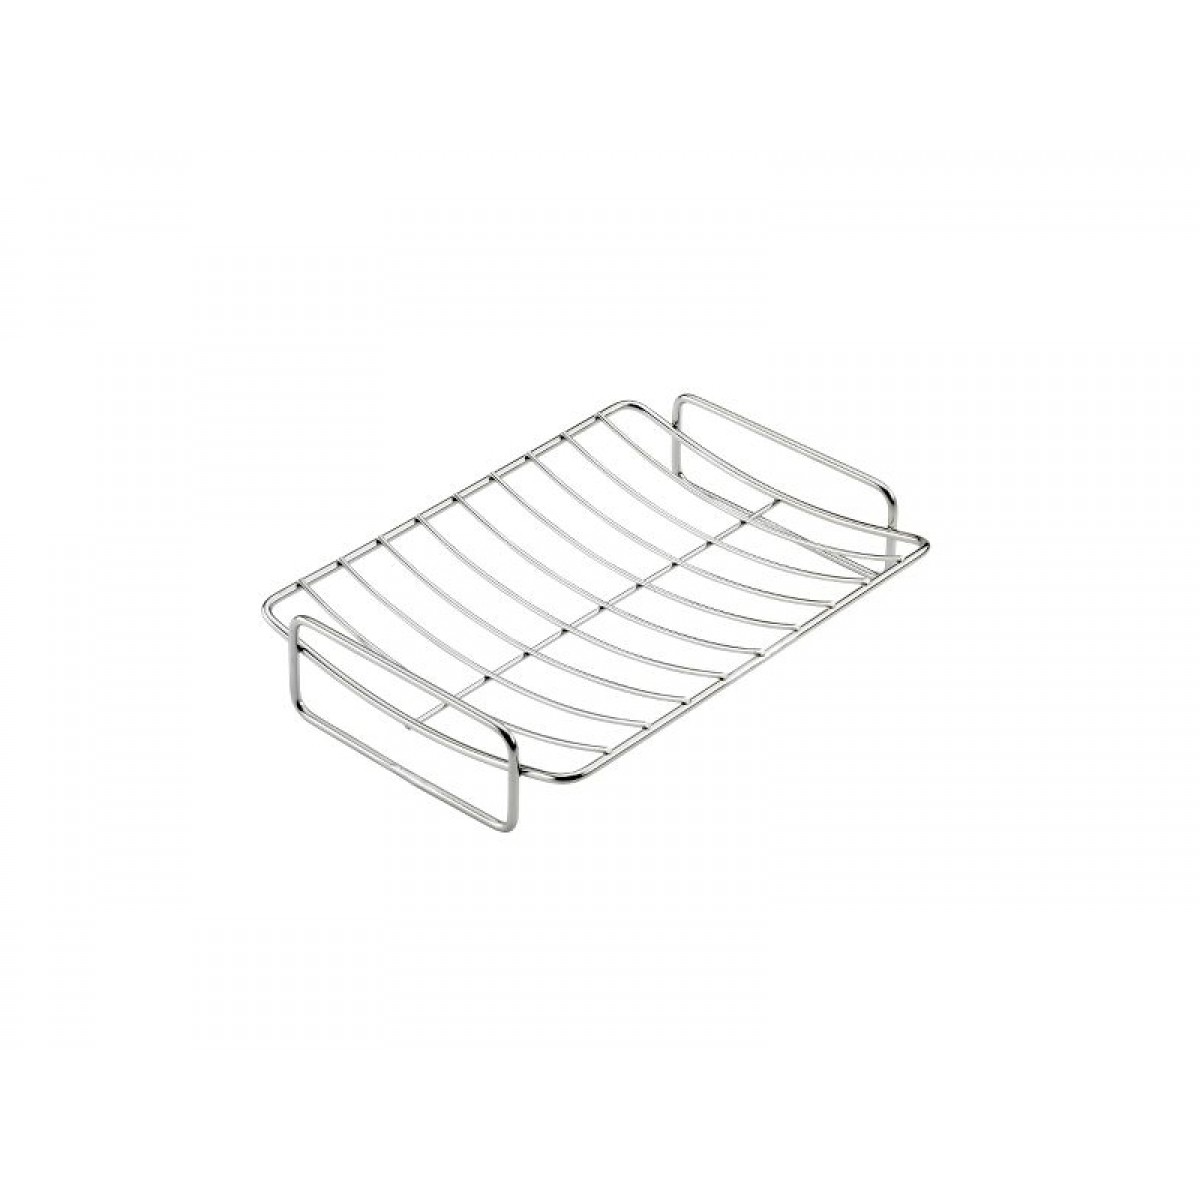 SCANPAN Rist til stor bradepande classic 29x23.5 cm